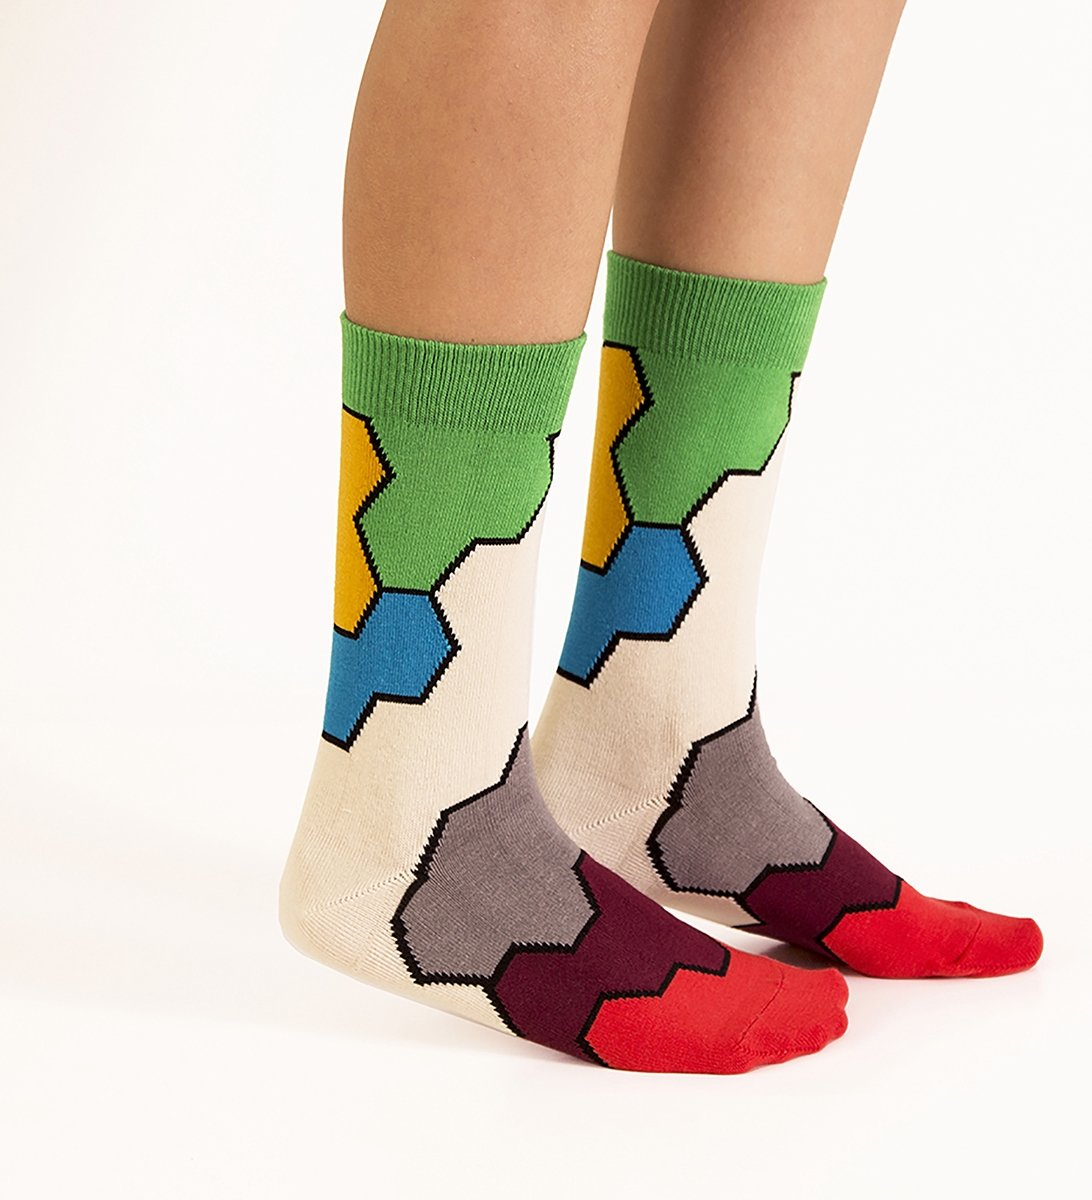 Ballonet Socks - Molecule / 41-46